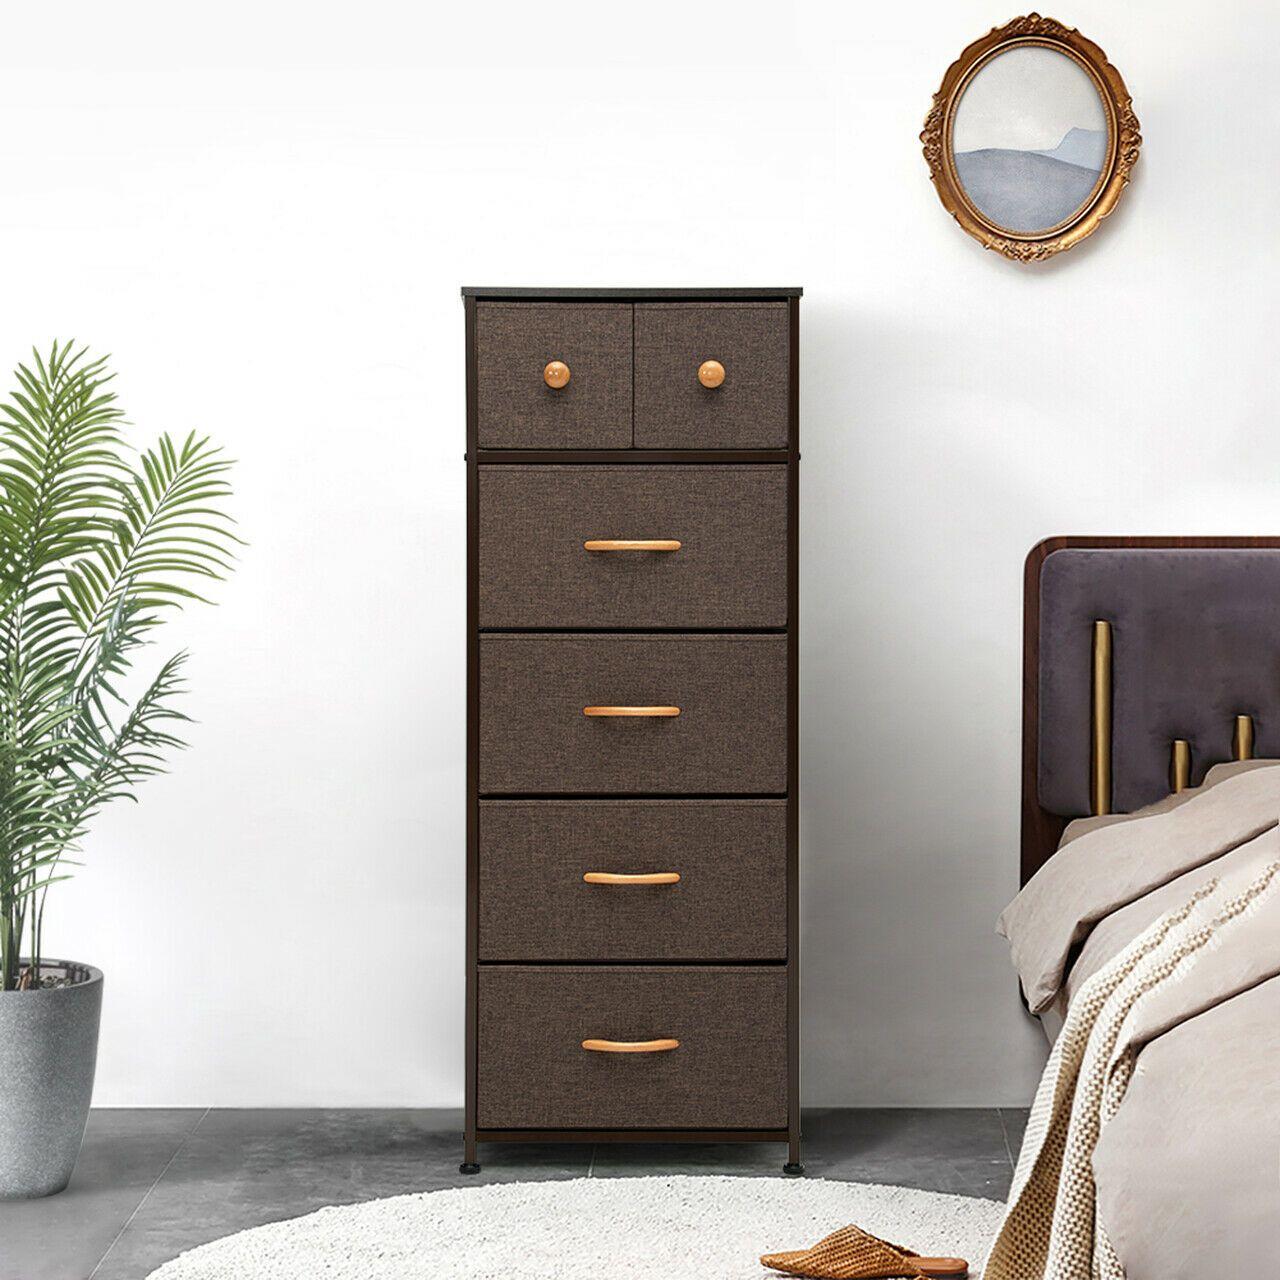 Dresser Bedside Drawers Furniture Storage Tower Organizer Unit Bedroom Office Us Ebay In 2020 Dresser Storage Storage Furniture Drawers